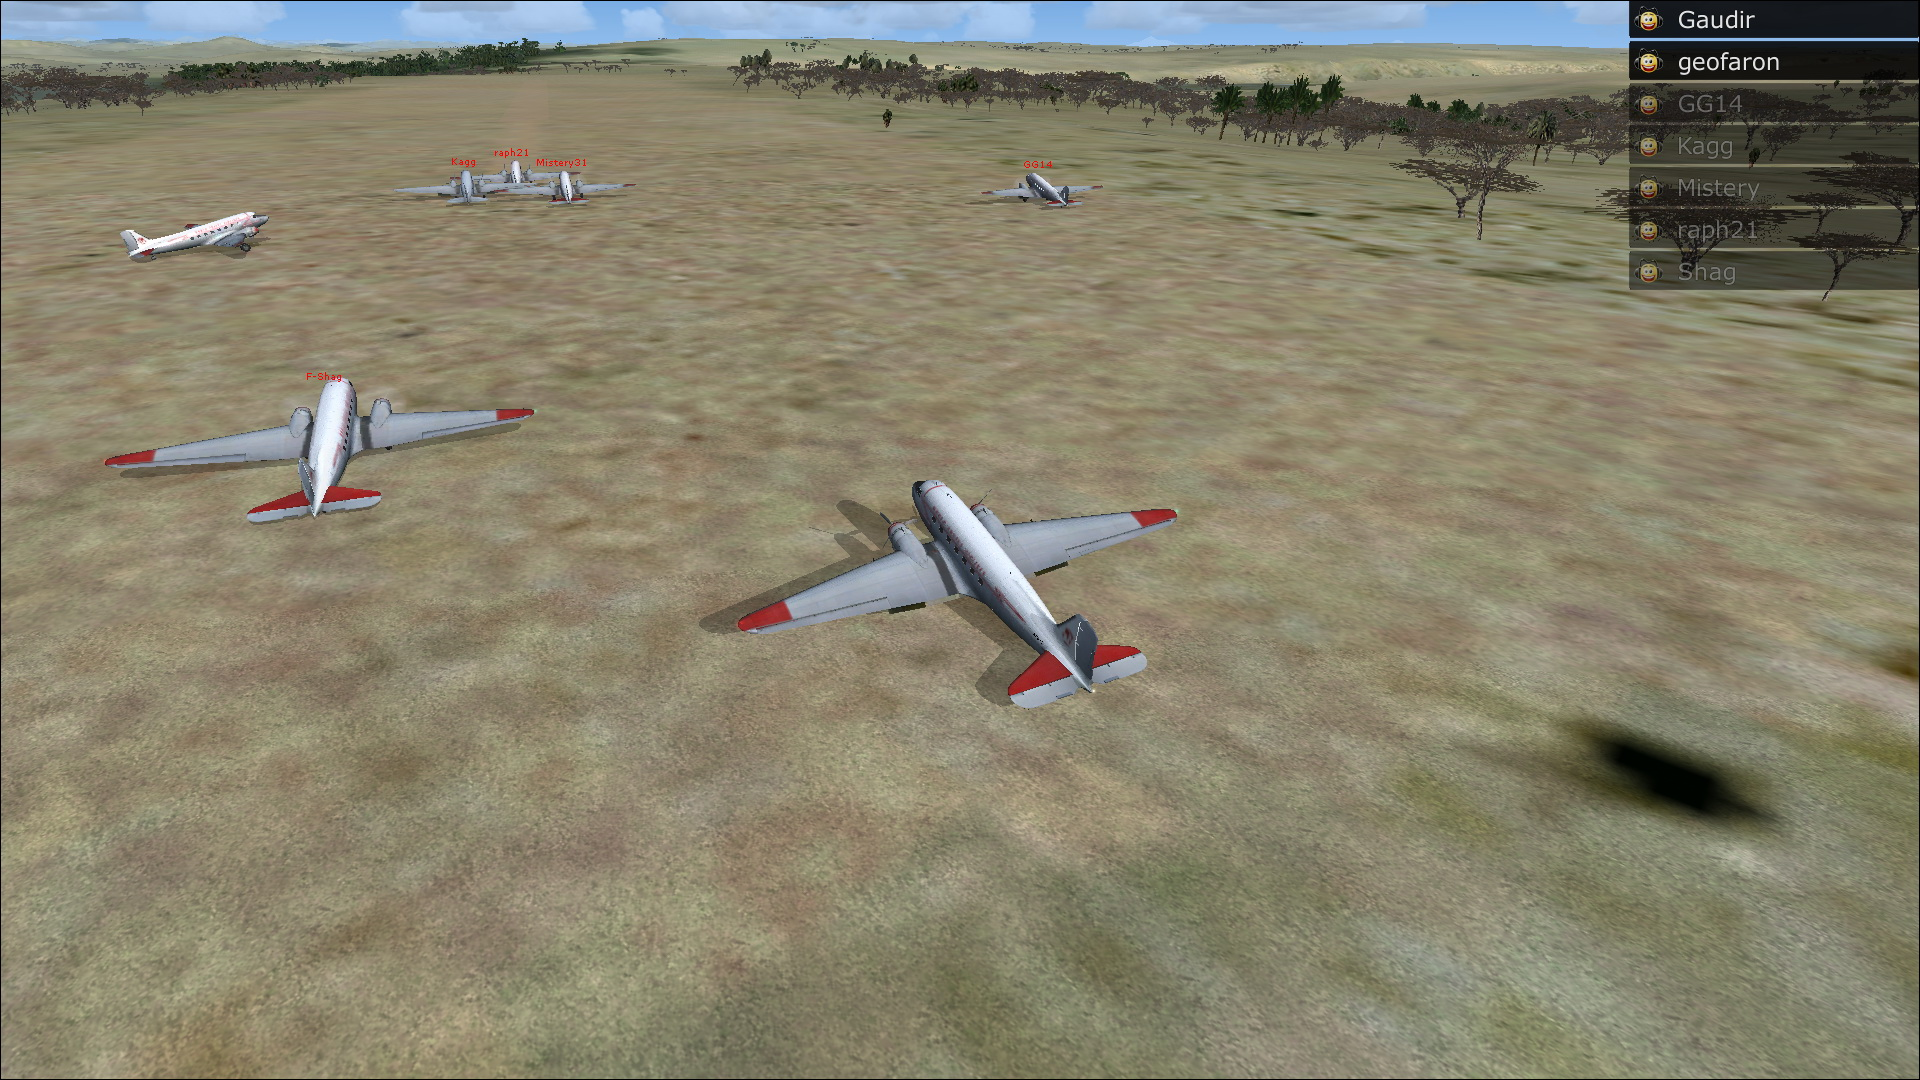 Vol en formation en Afrique (DC3) 876411201322222414950